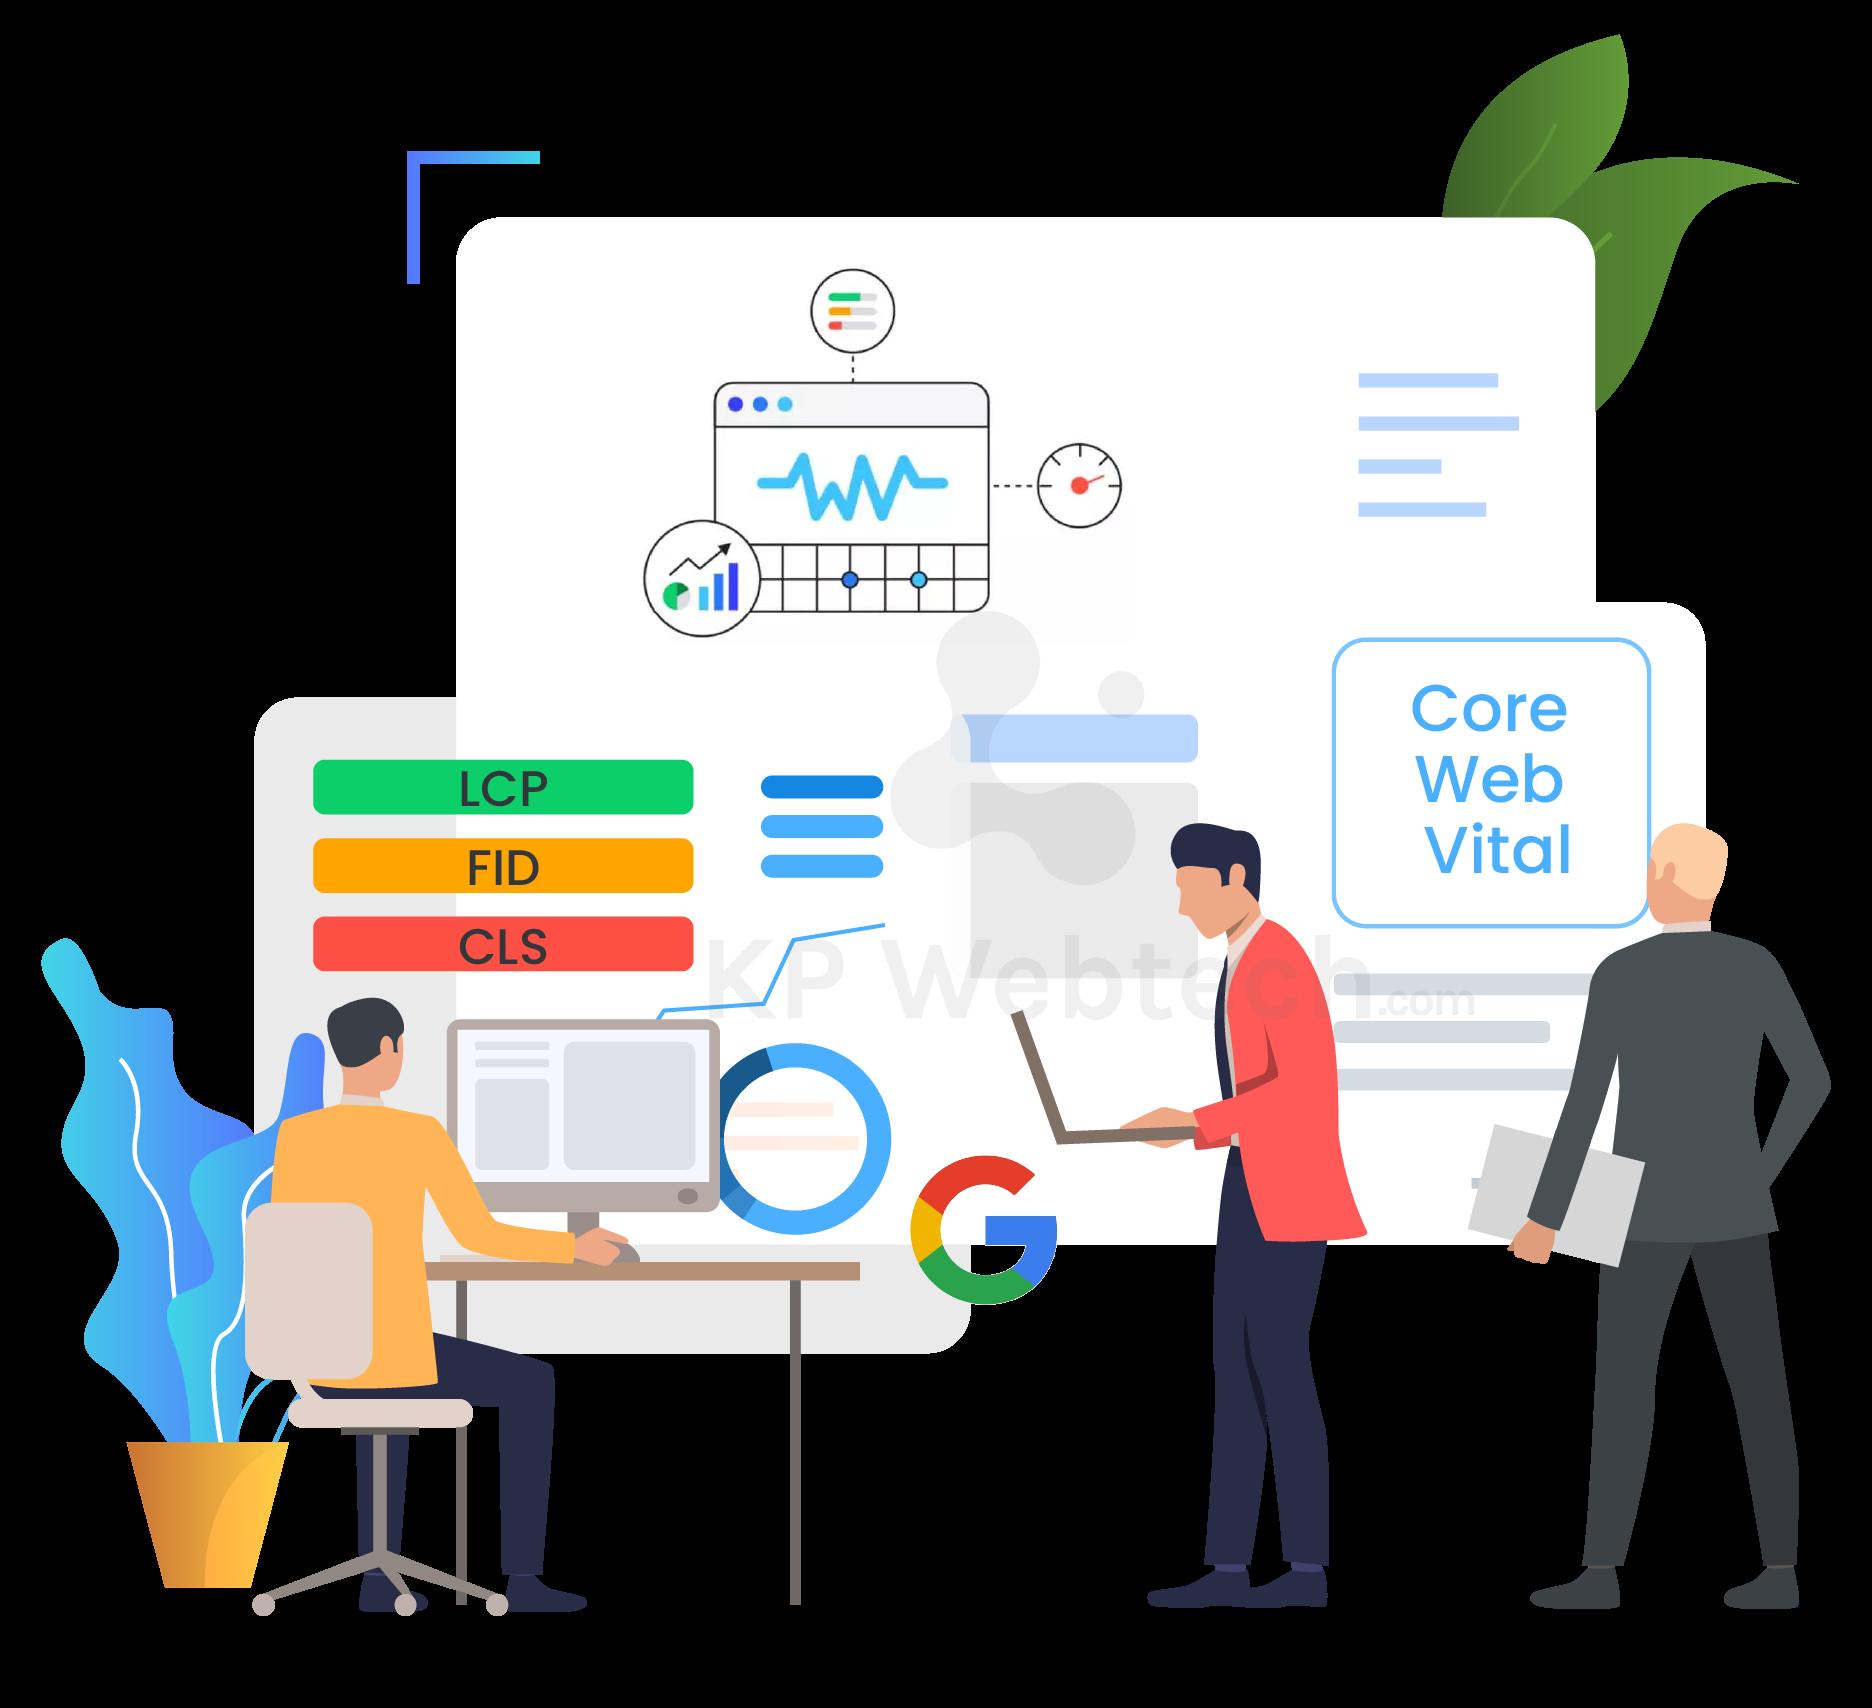 Improve Your Core Web Vitals Scores